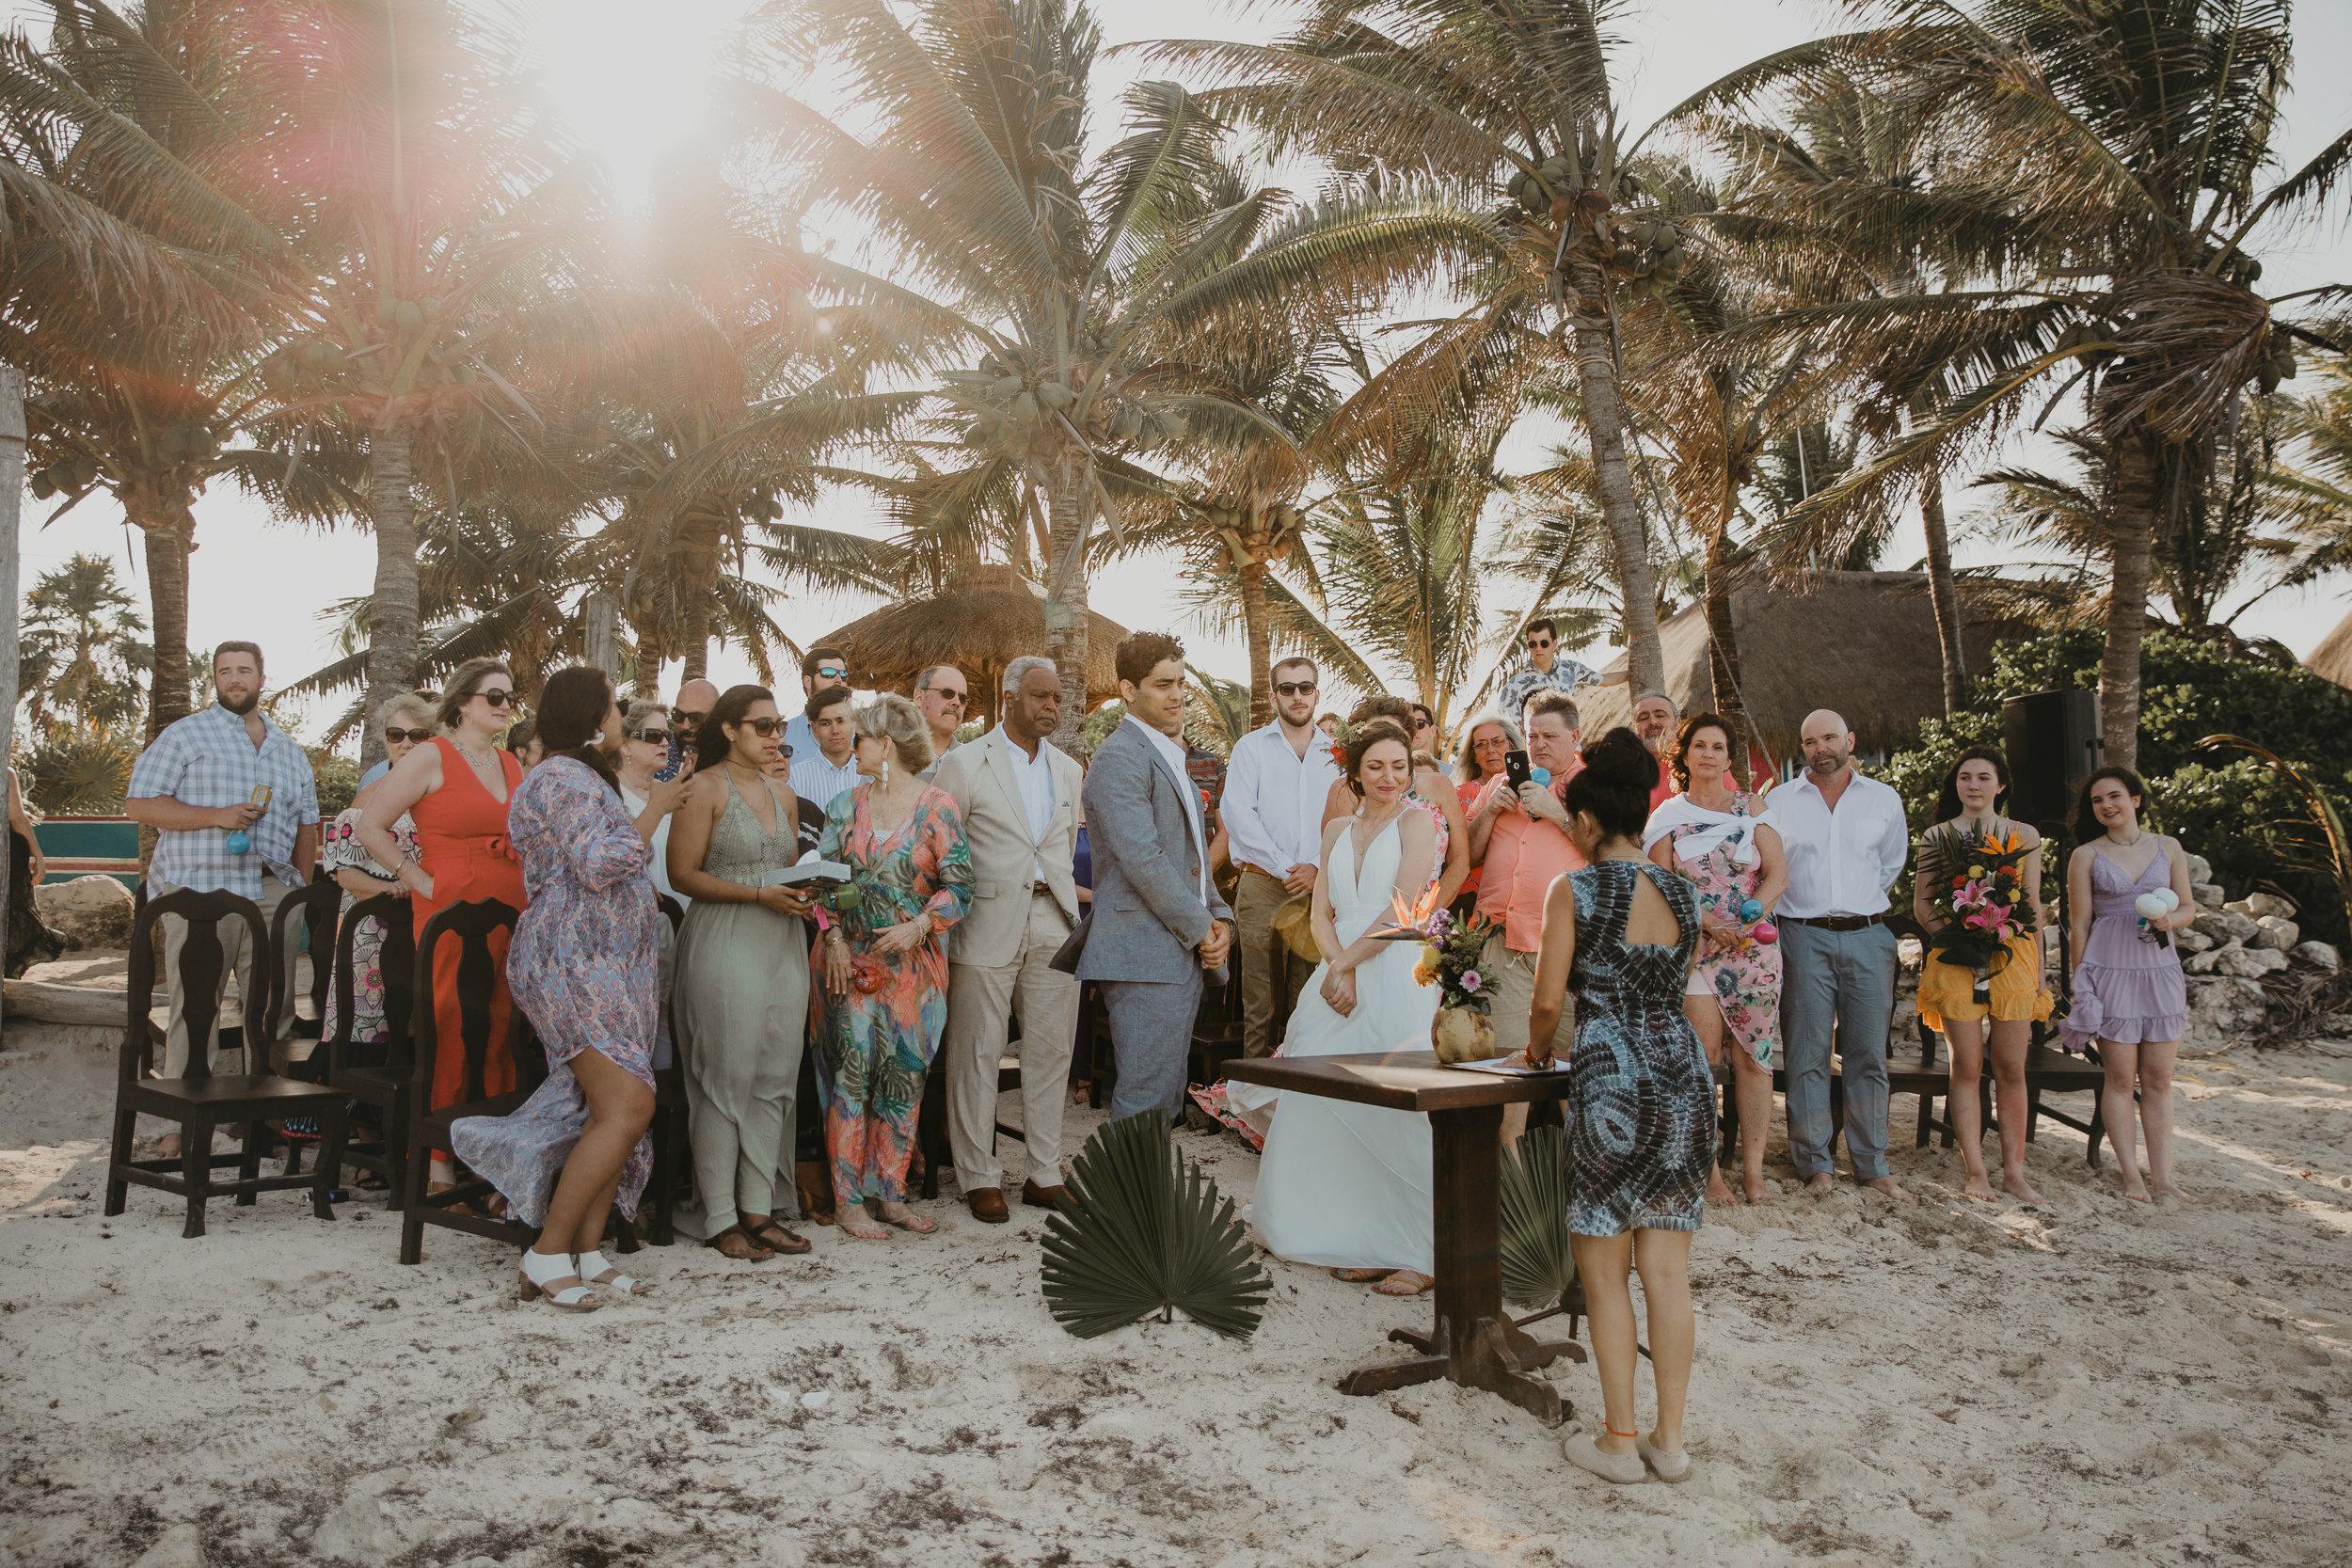 Nicole-Daacke-Photography-beachfront-akumal-destionation-wedding-tulum-mexico-elopement-photographer-destination-wedding-inspiration-sunset-champagne-pop-boho-bride-ocean-tropical-bohemian-tulum-wedding-photos-157.jpg